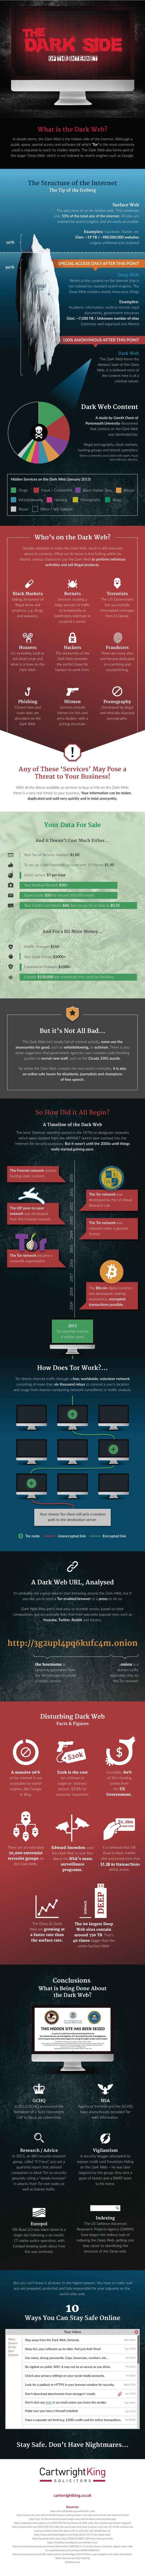 The Dark Web - Dark Side of the Internet - Xiologix